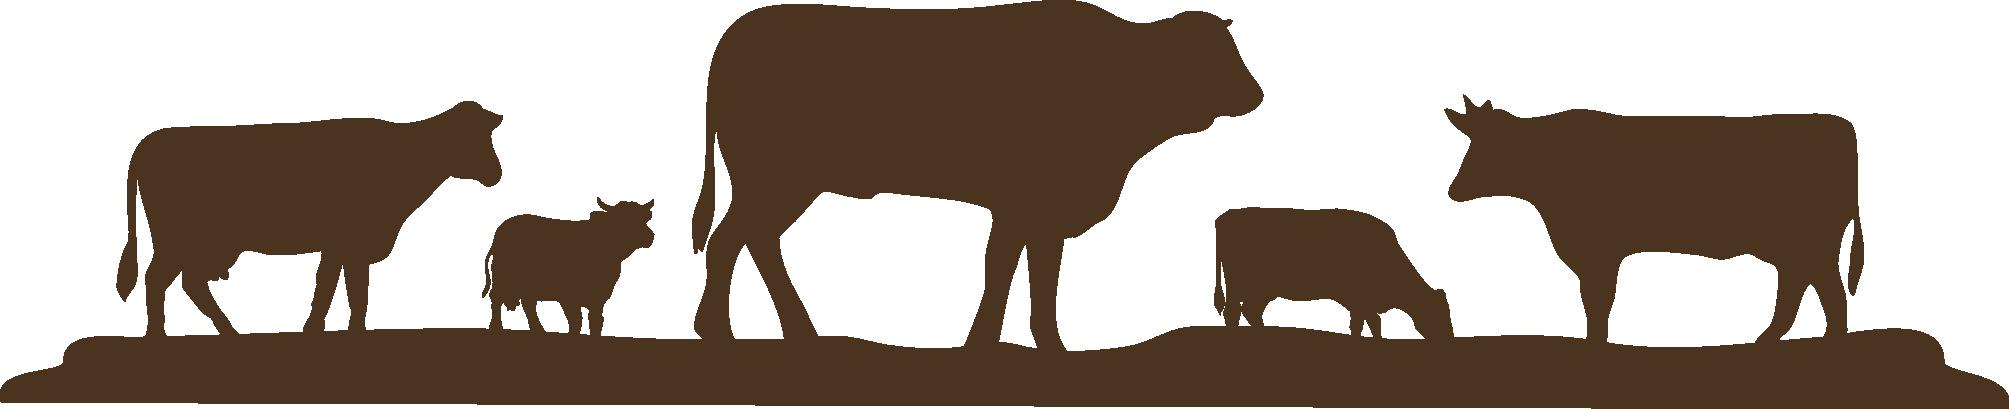 Farm info reese cattle. Cow clipart shadow